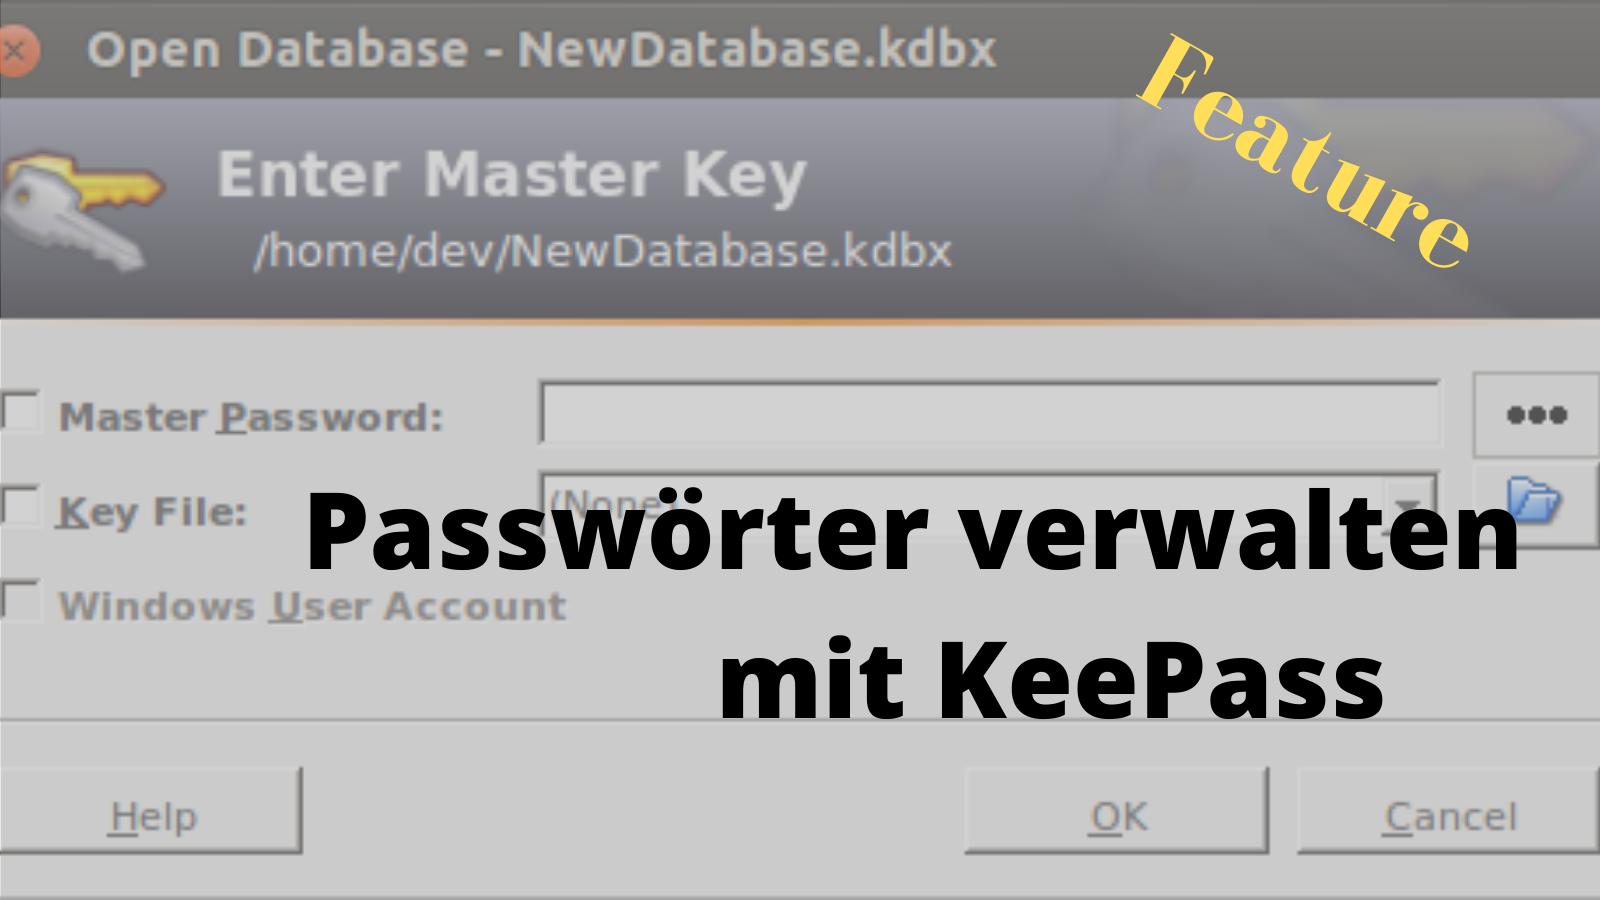 Passwörter verwalten mit KeePass